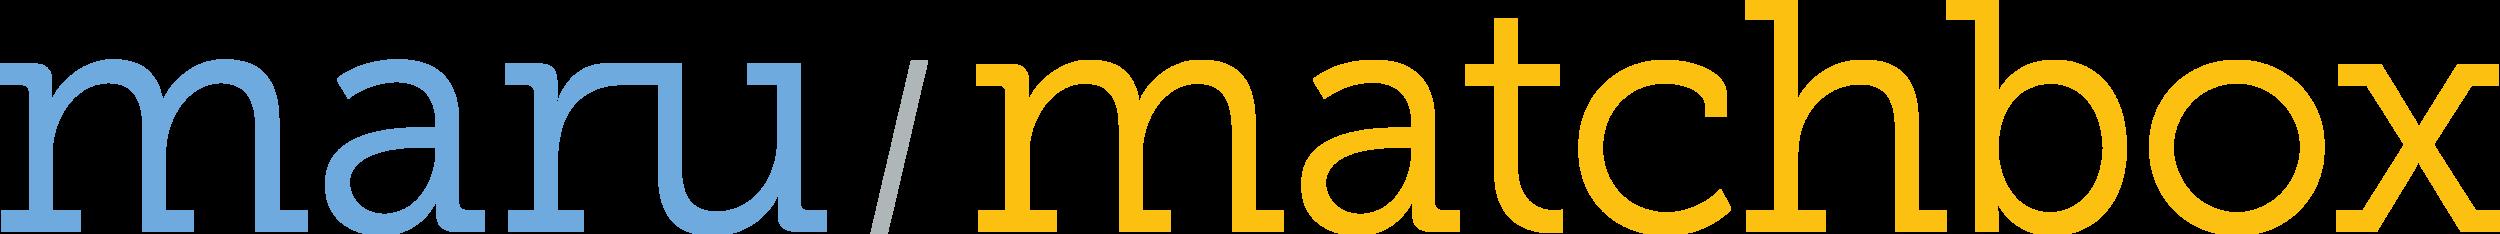 maru-matchbox-logo-blue-gold.png